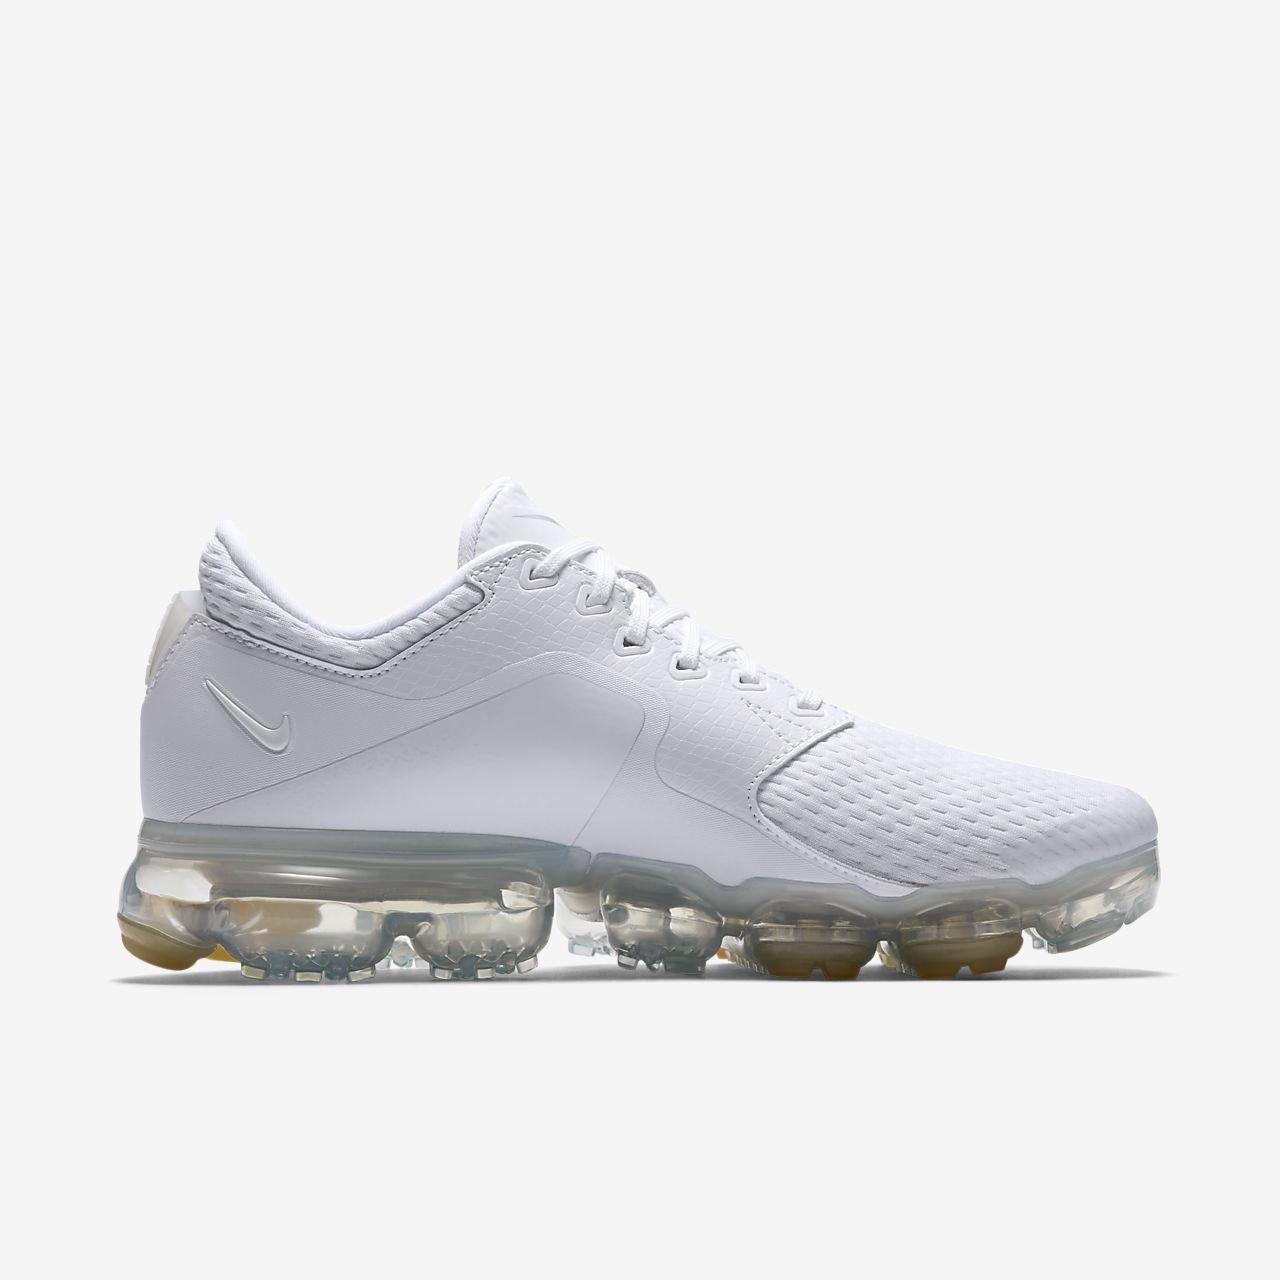 scarpe nike vapormax donna